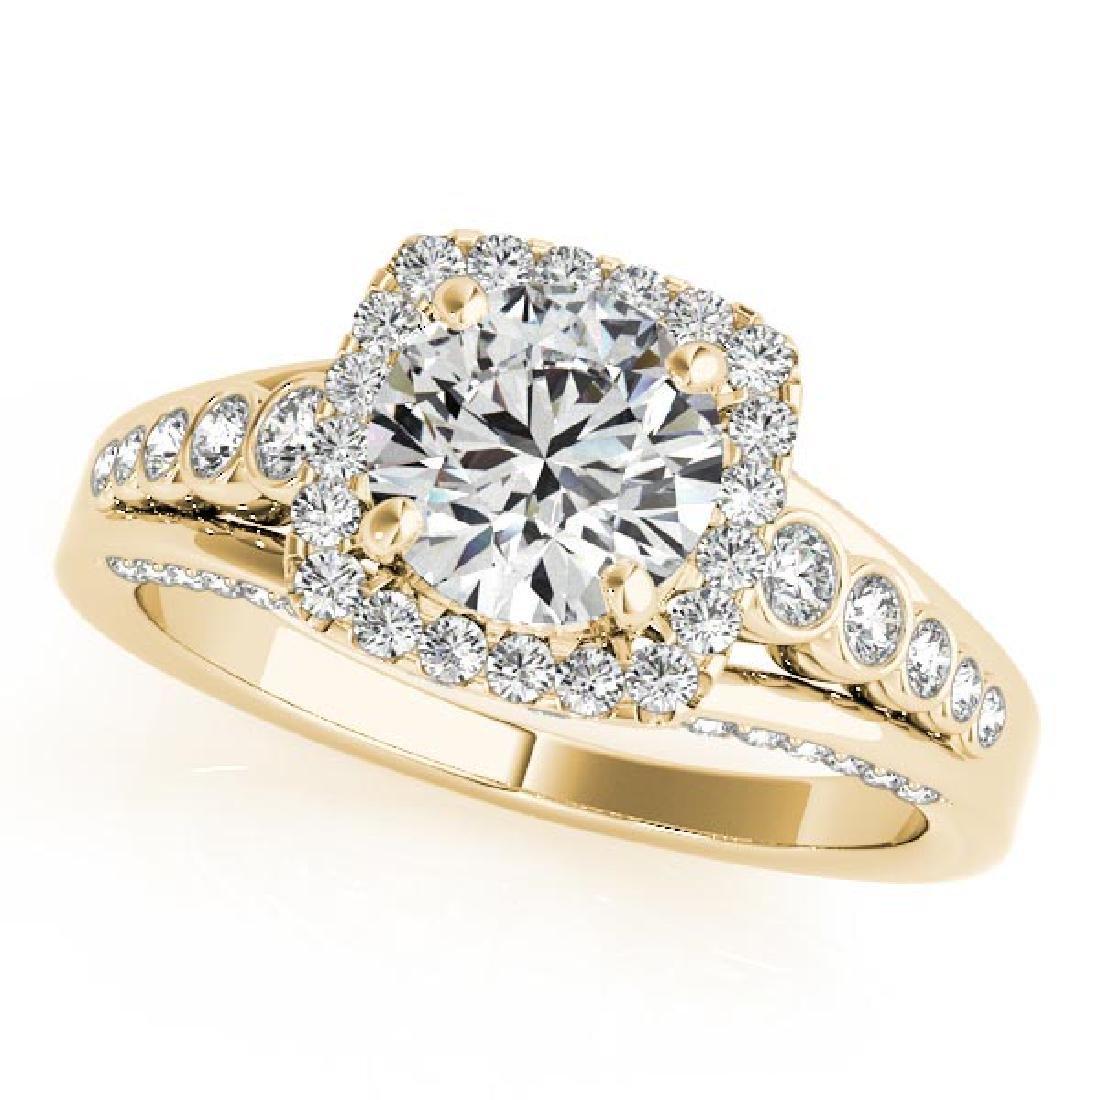 CERTIFIED 18K YELLOW GOLD 1.02 CT G-H/VS-SI1 DIAMOND HA